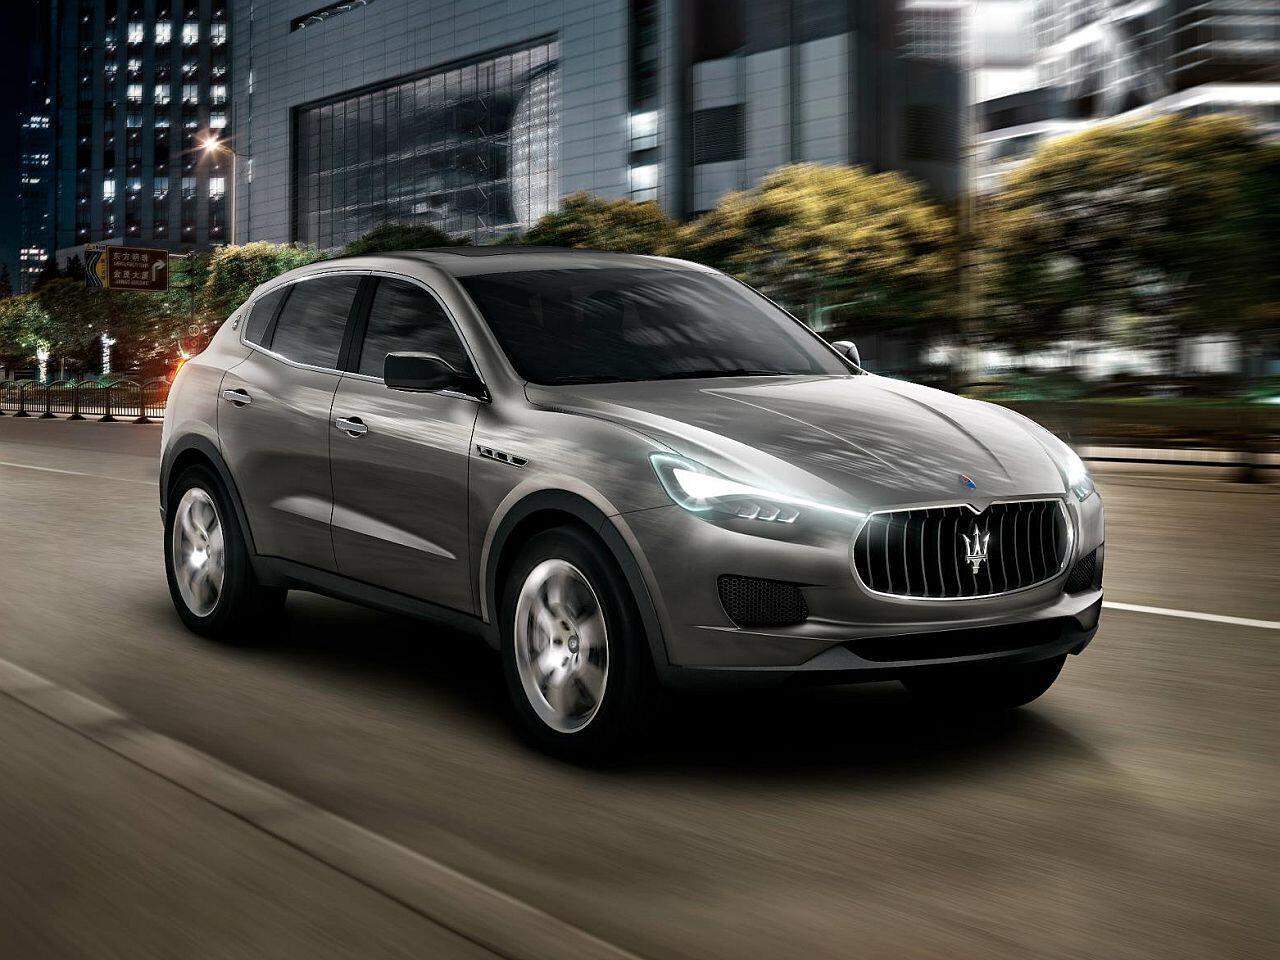 Bild zu Maserati Kubang